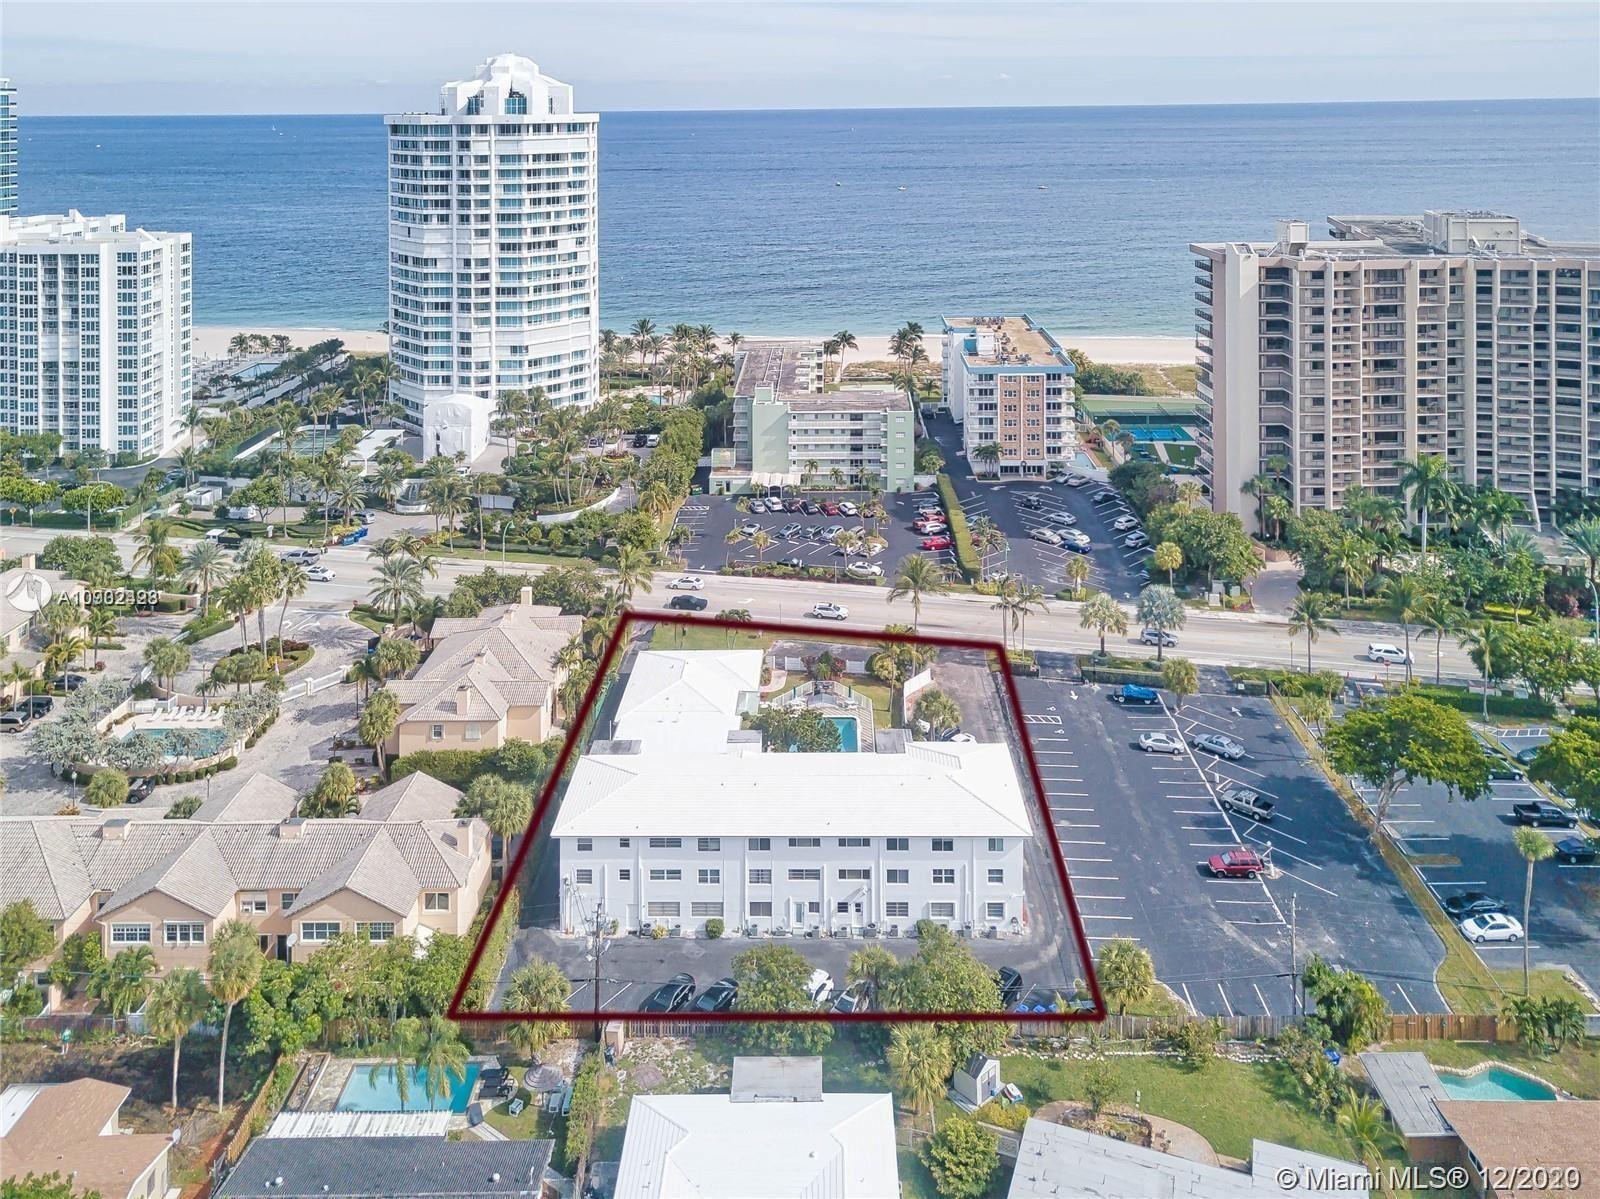 1751 S Ocean Blvd #101W, Lauderdale by the Sea, FL 33062 - #: A10902428